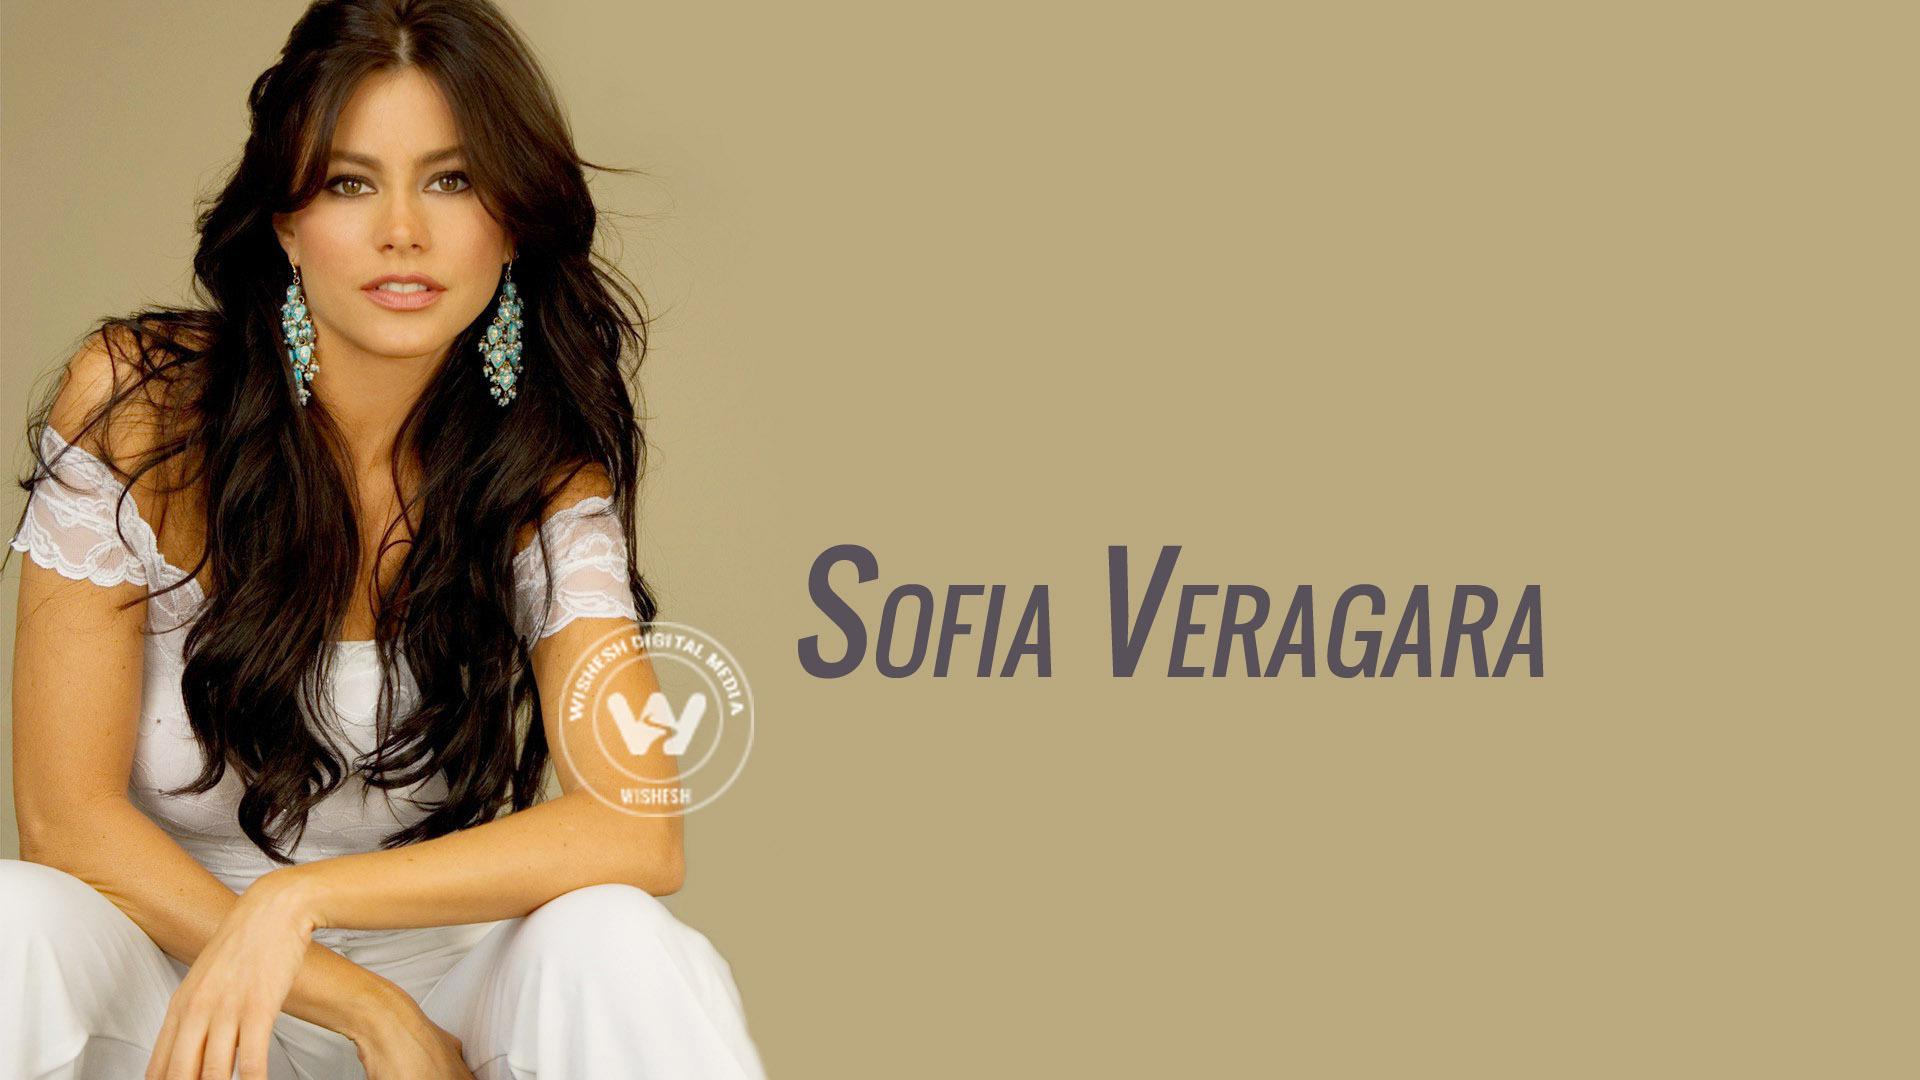 Sofia Vergara High Definition Wallpapers